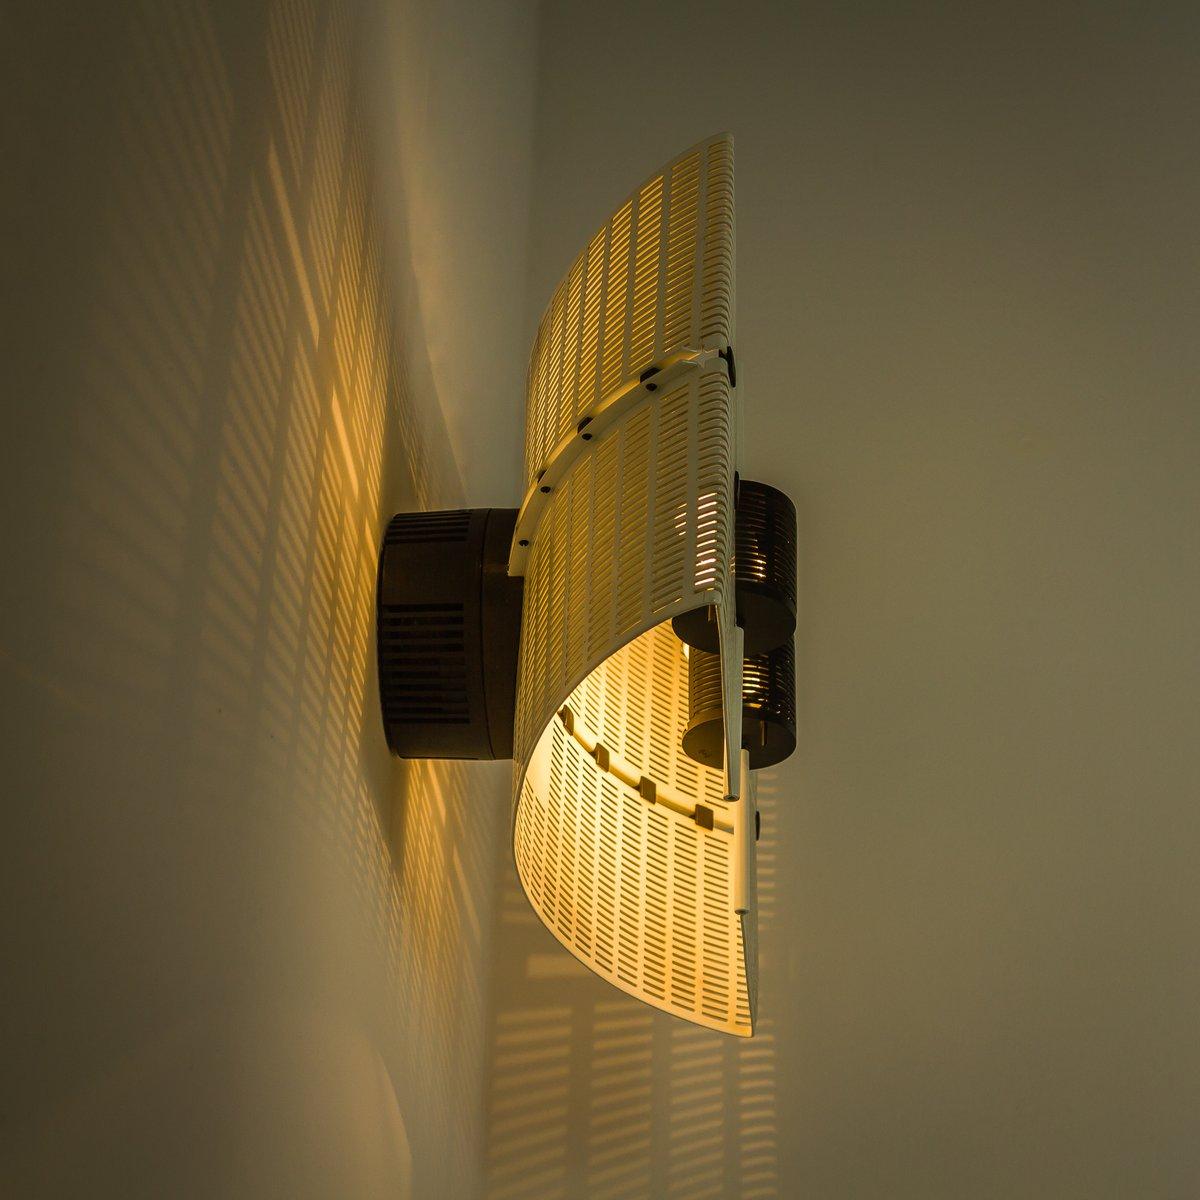 fidia wandlampe von mario botta f r artemide 1987 bei. Black Bedroom Furniture Sets. Home Design Ideas